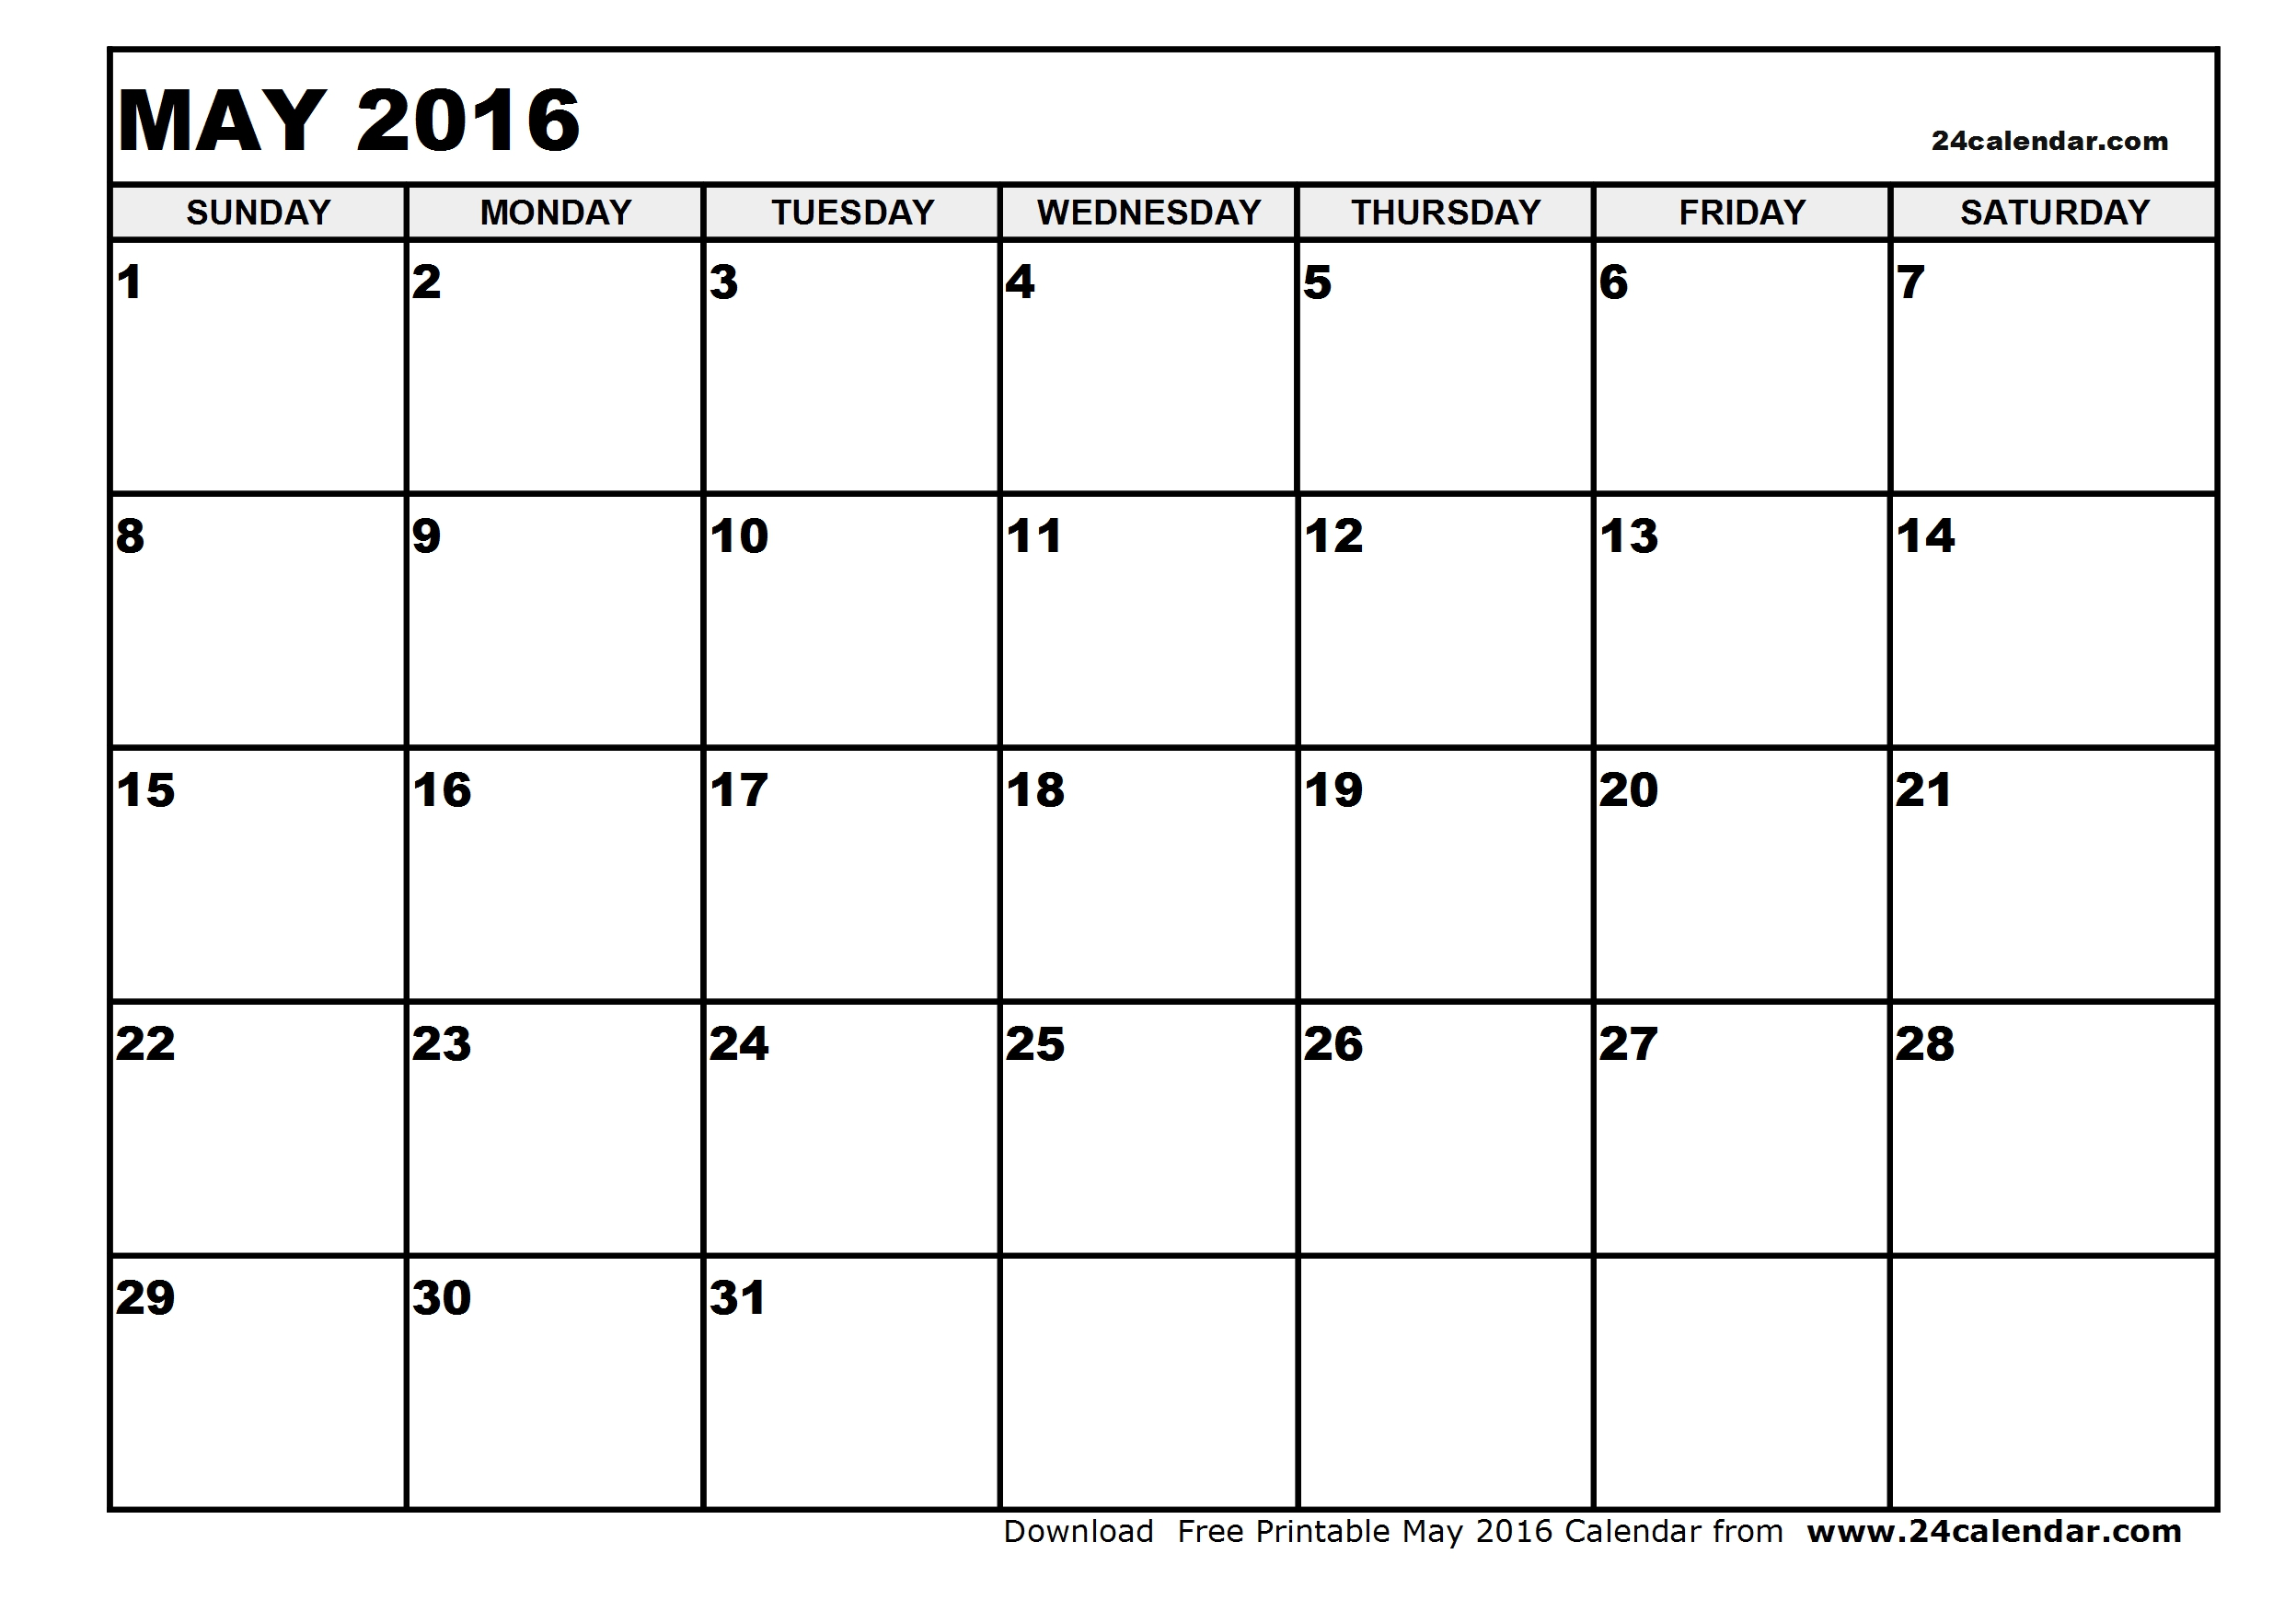 printable-may-2016-calendar-may-2016-calendar-1-fbECwT.jpg